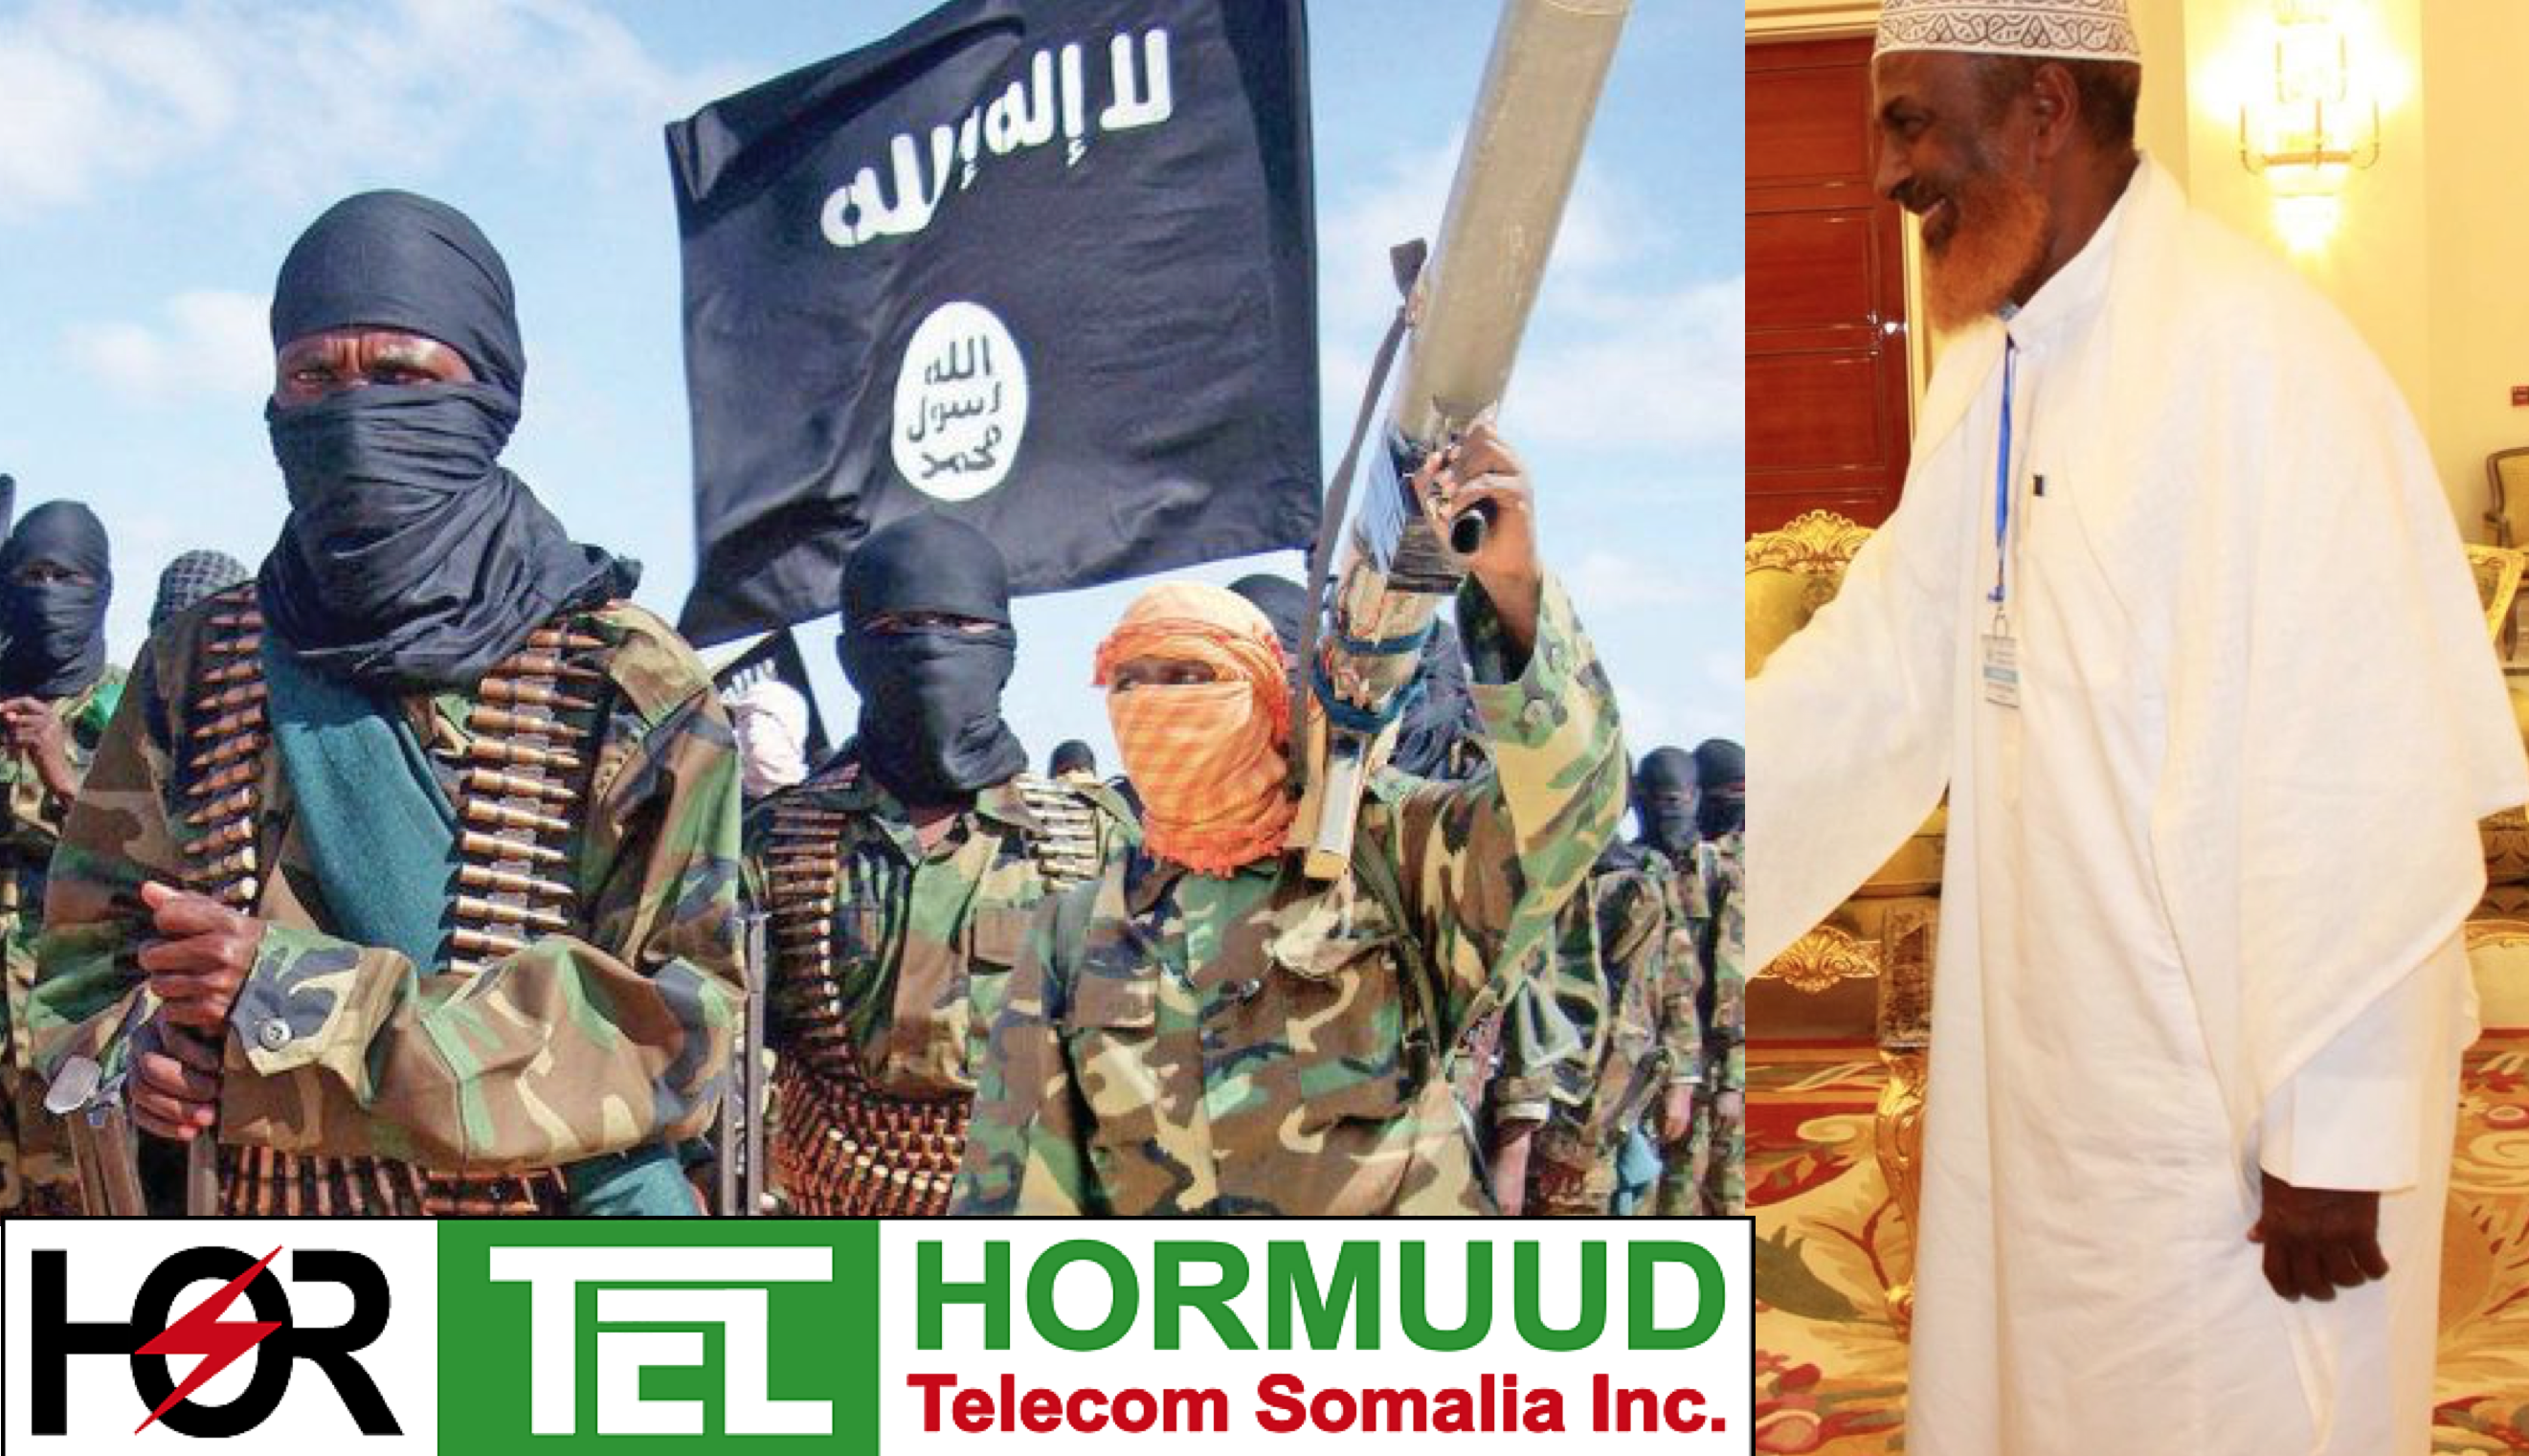 "Somalia:Ahmed Nur Ali Jim'ale, Al-Shabaab's chief financier But the Hormuud Telecom carries the public stigma of being ""one of the single largest financiers of Al-Shabaab"